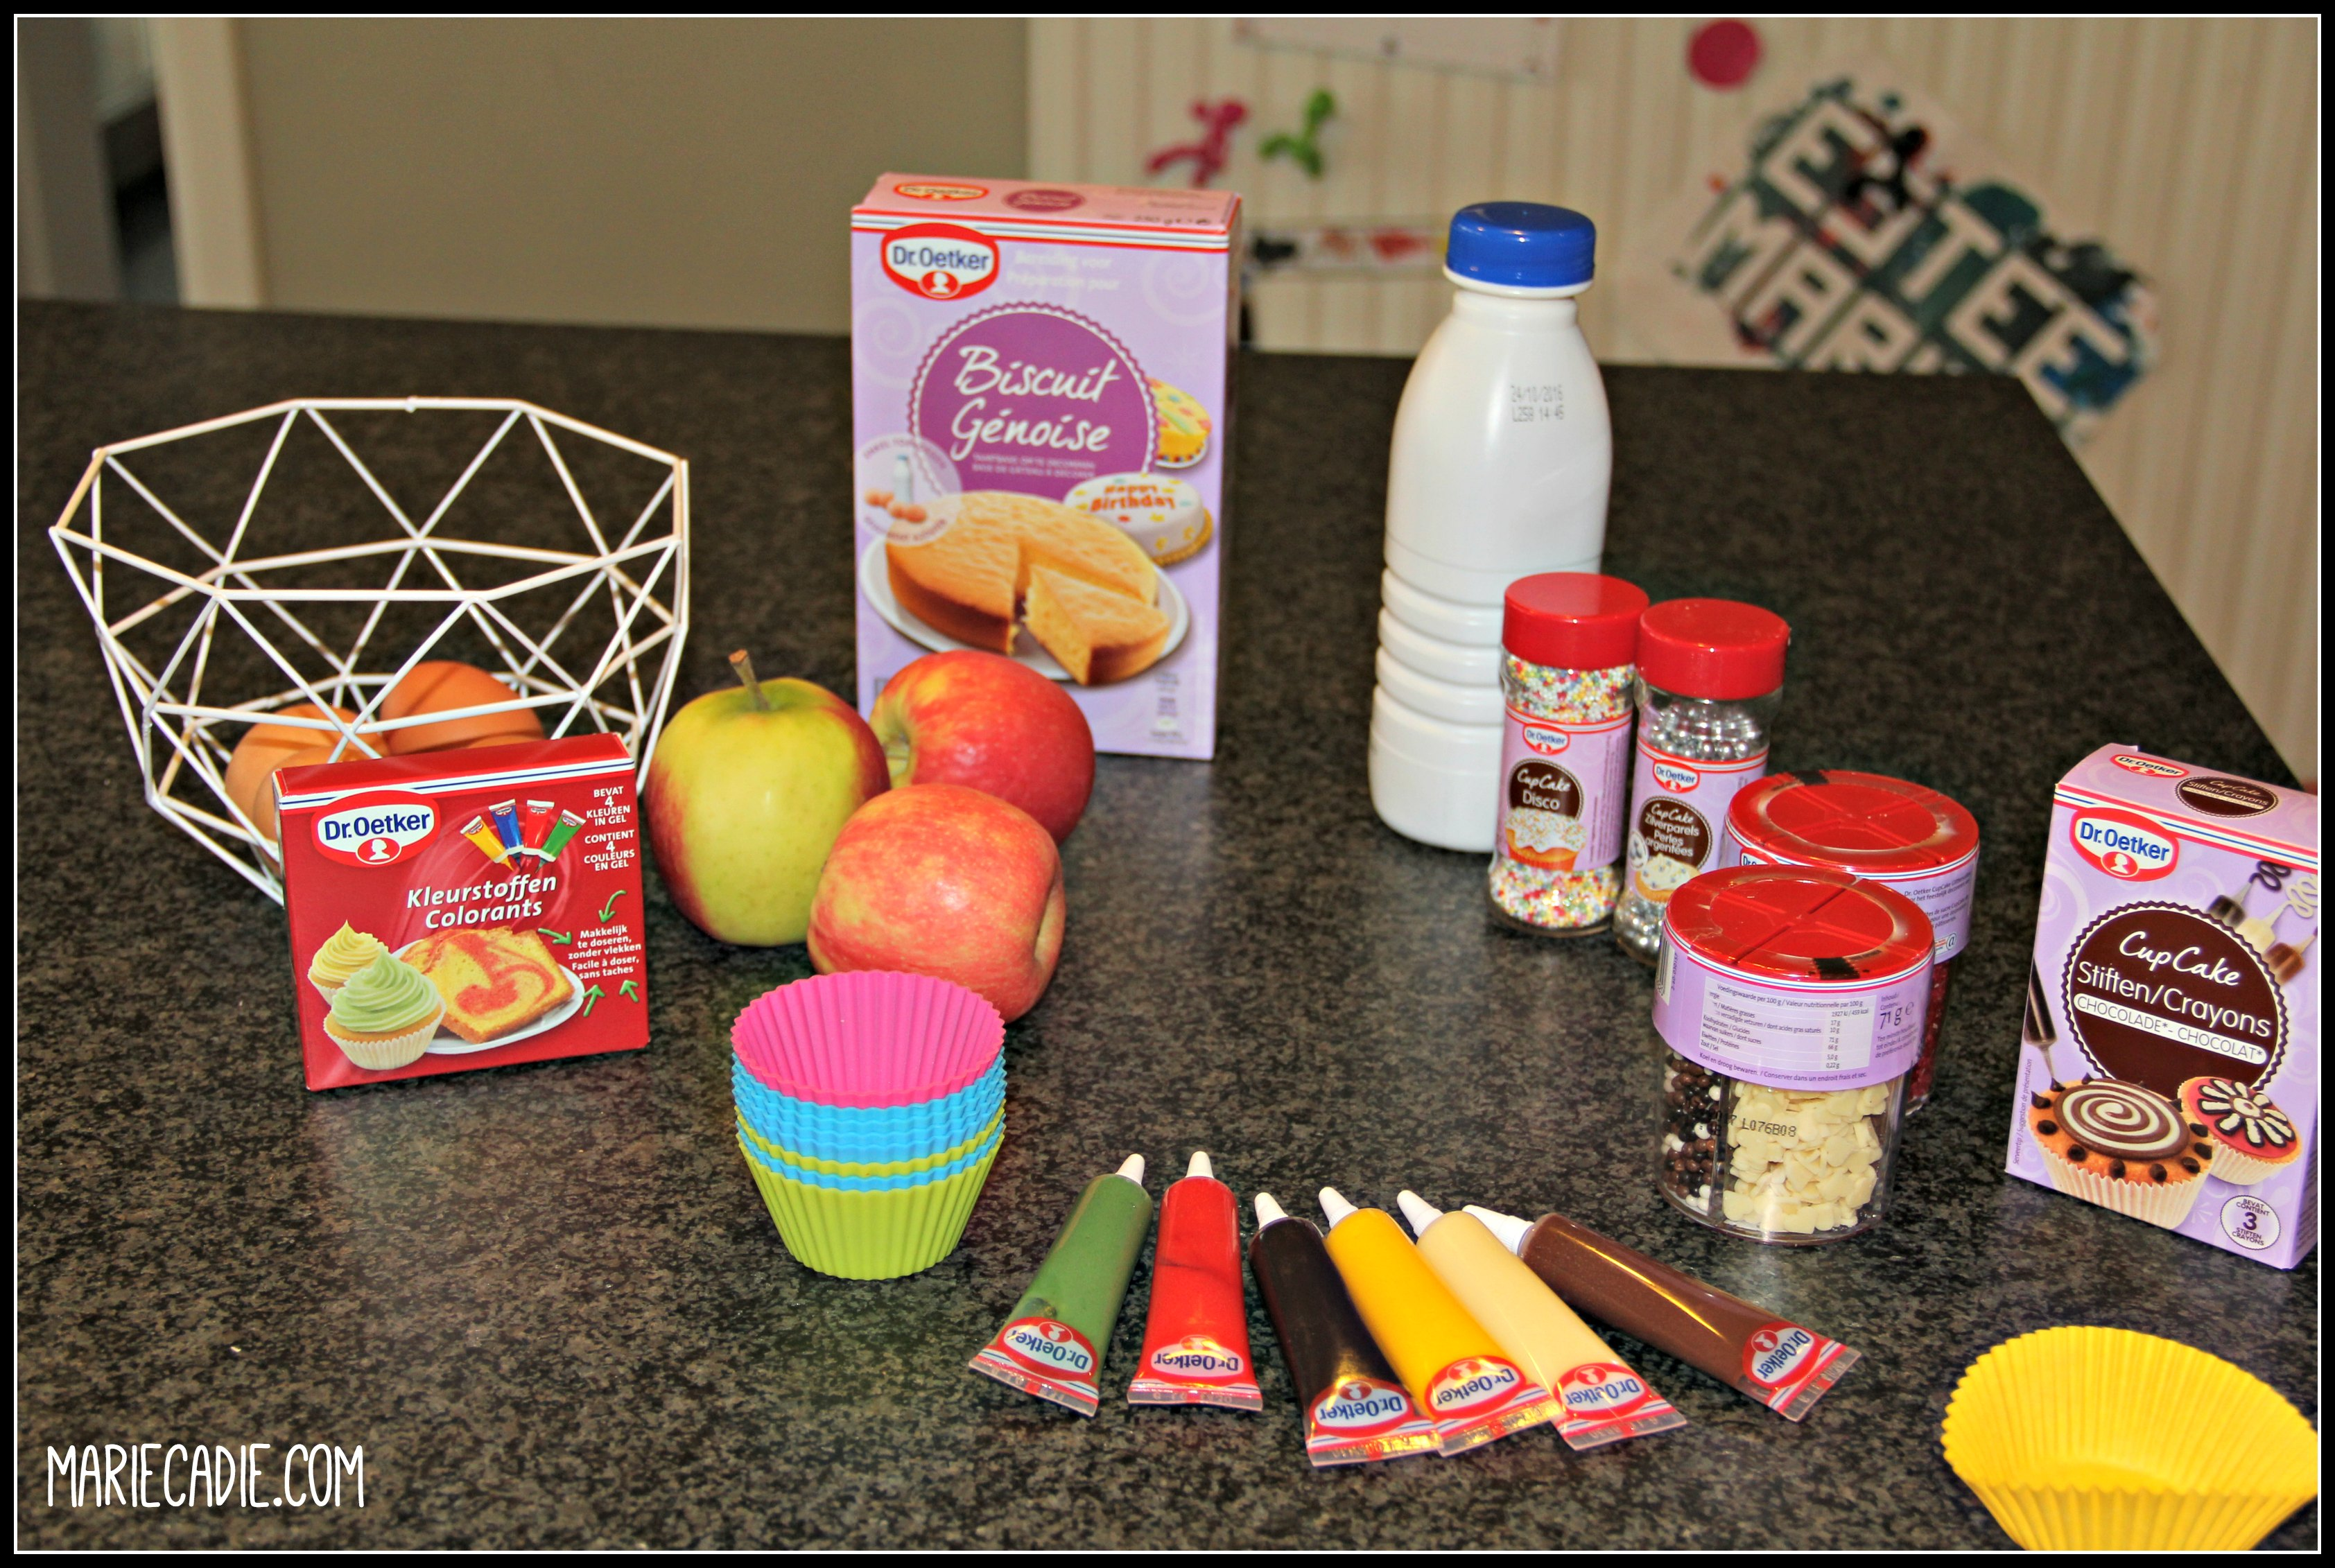 mariecadie-com-red-velvet-rainbow-cupcakes-1